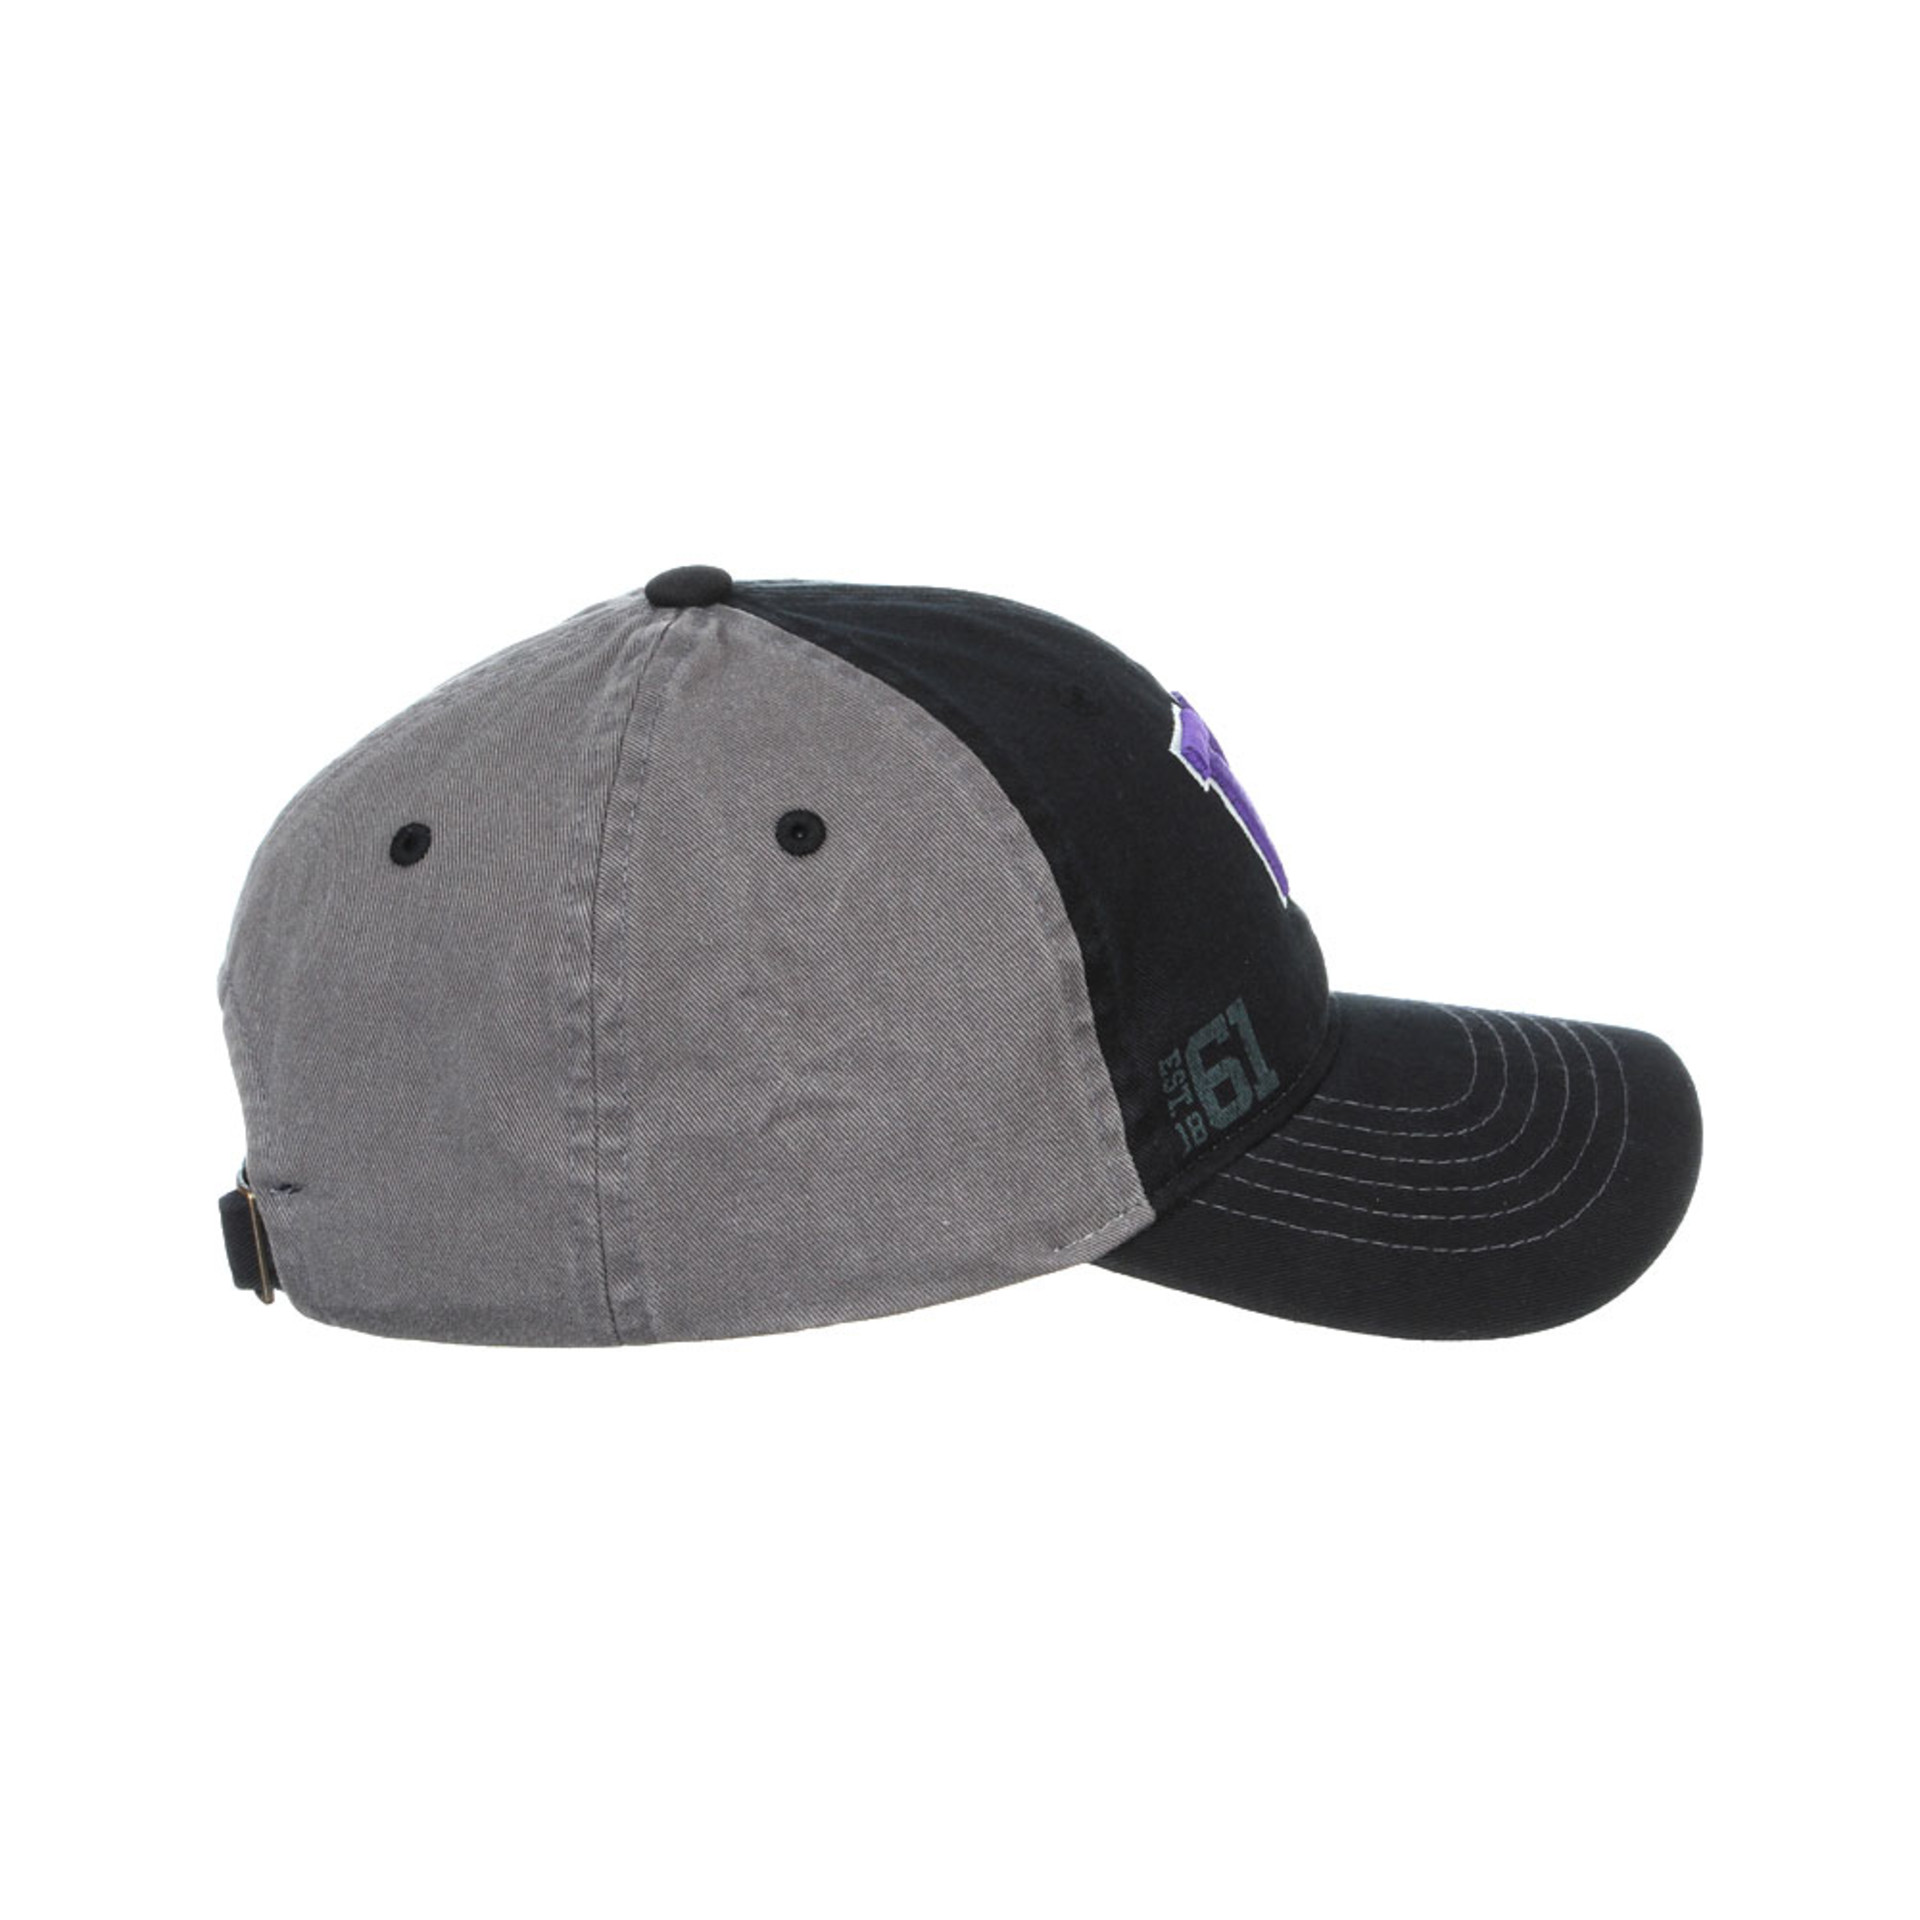 Zephyr Unisex Black W Origin Adjustable Hat – Side